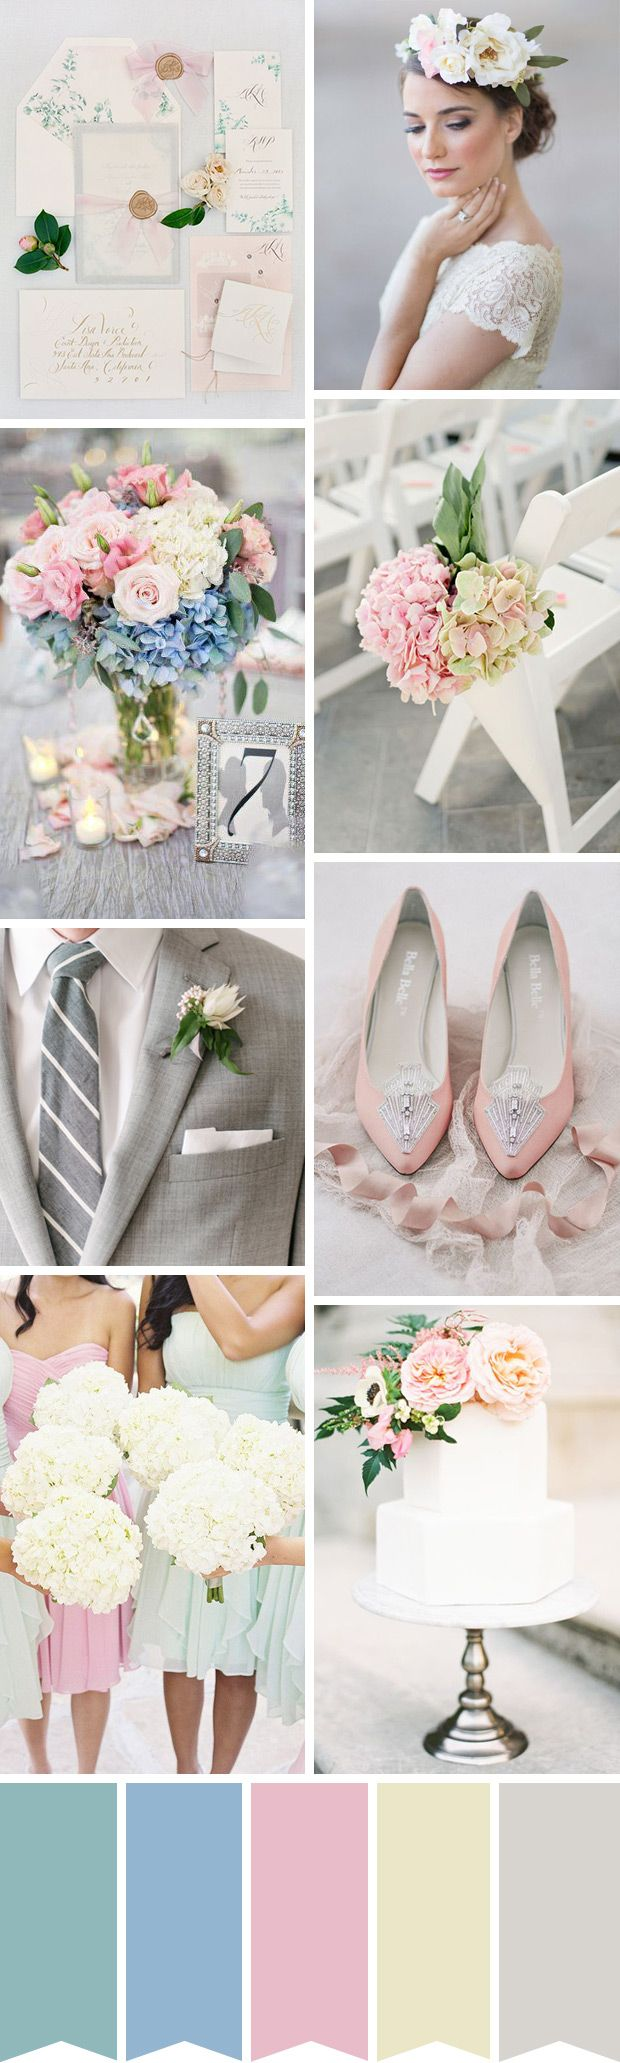 Elegant and Chic: Pastel Summer Wedding Inspiration | www.onefabday.com